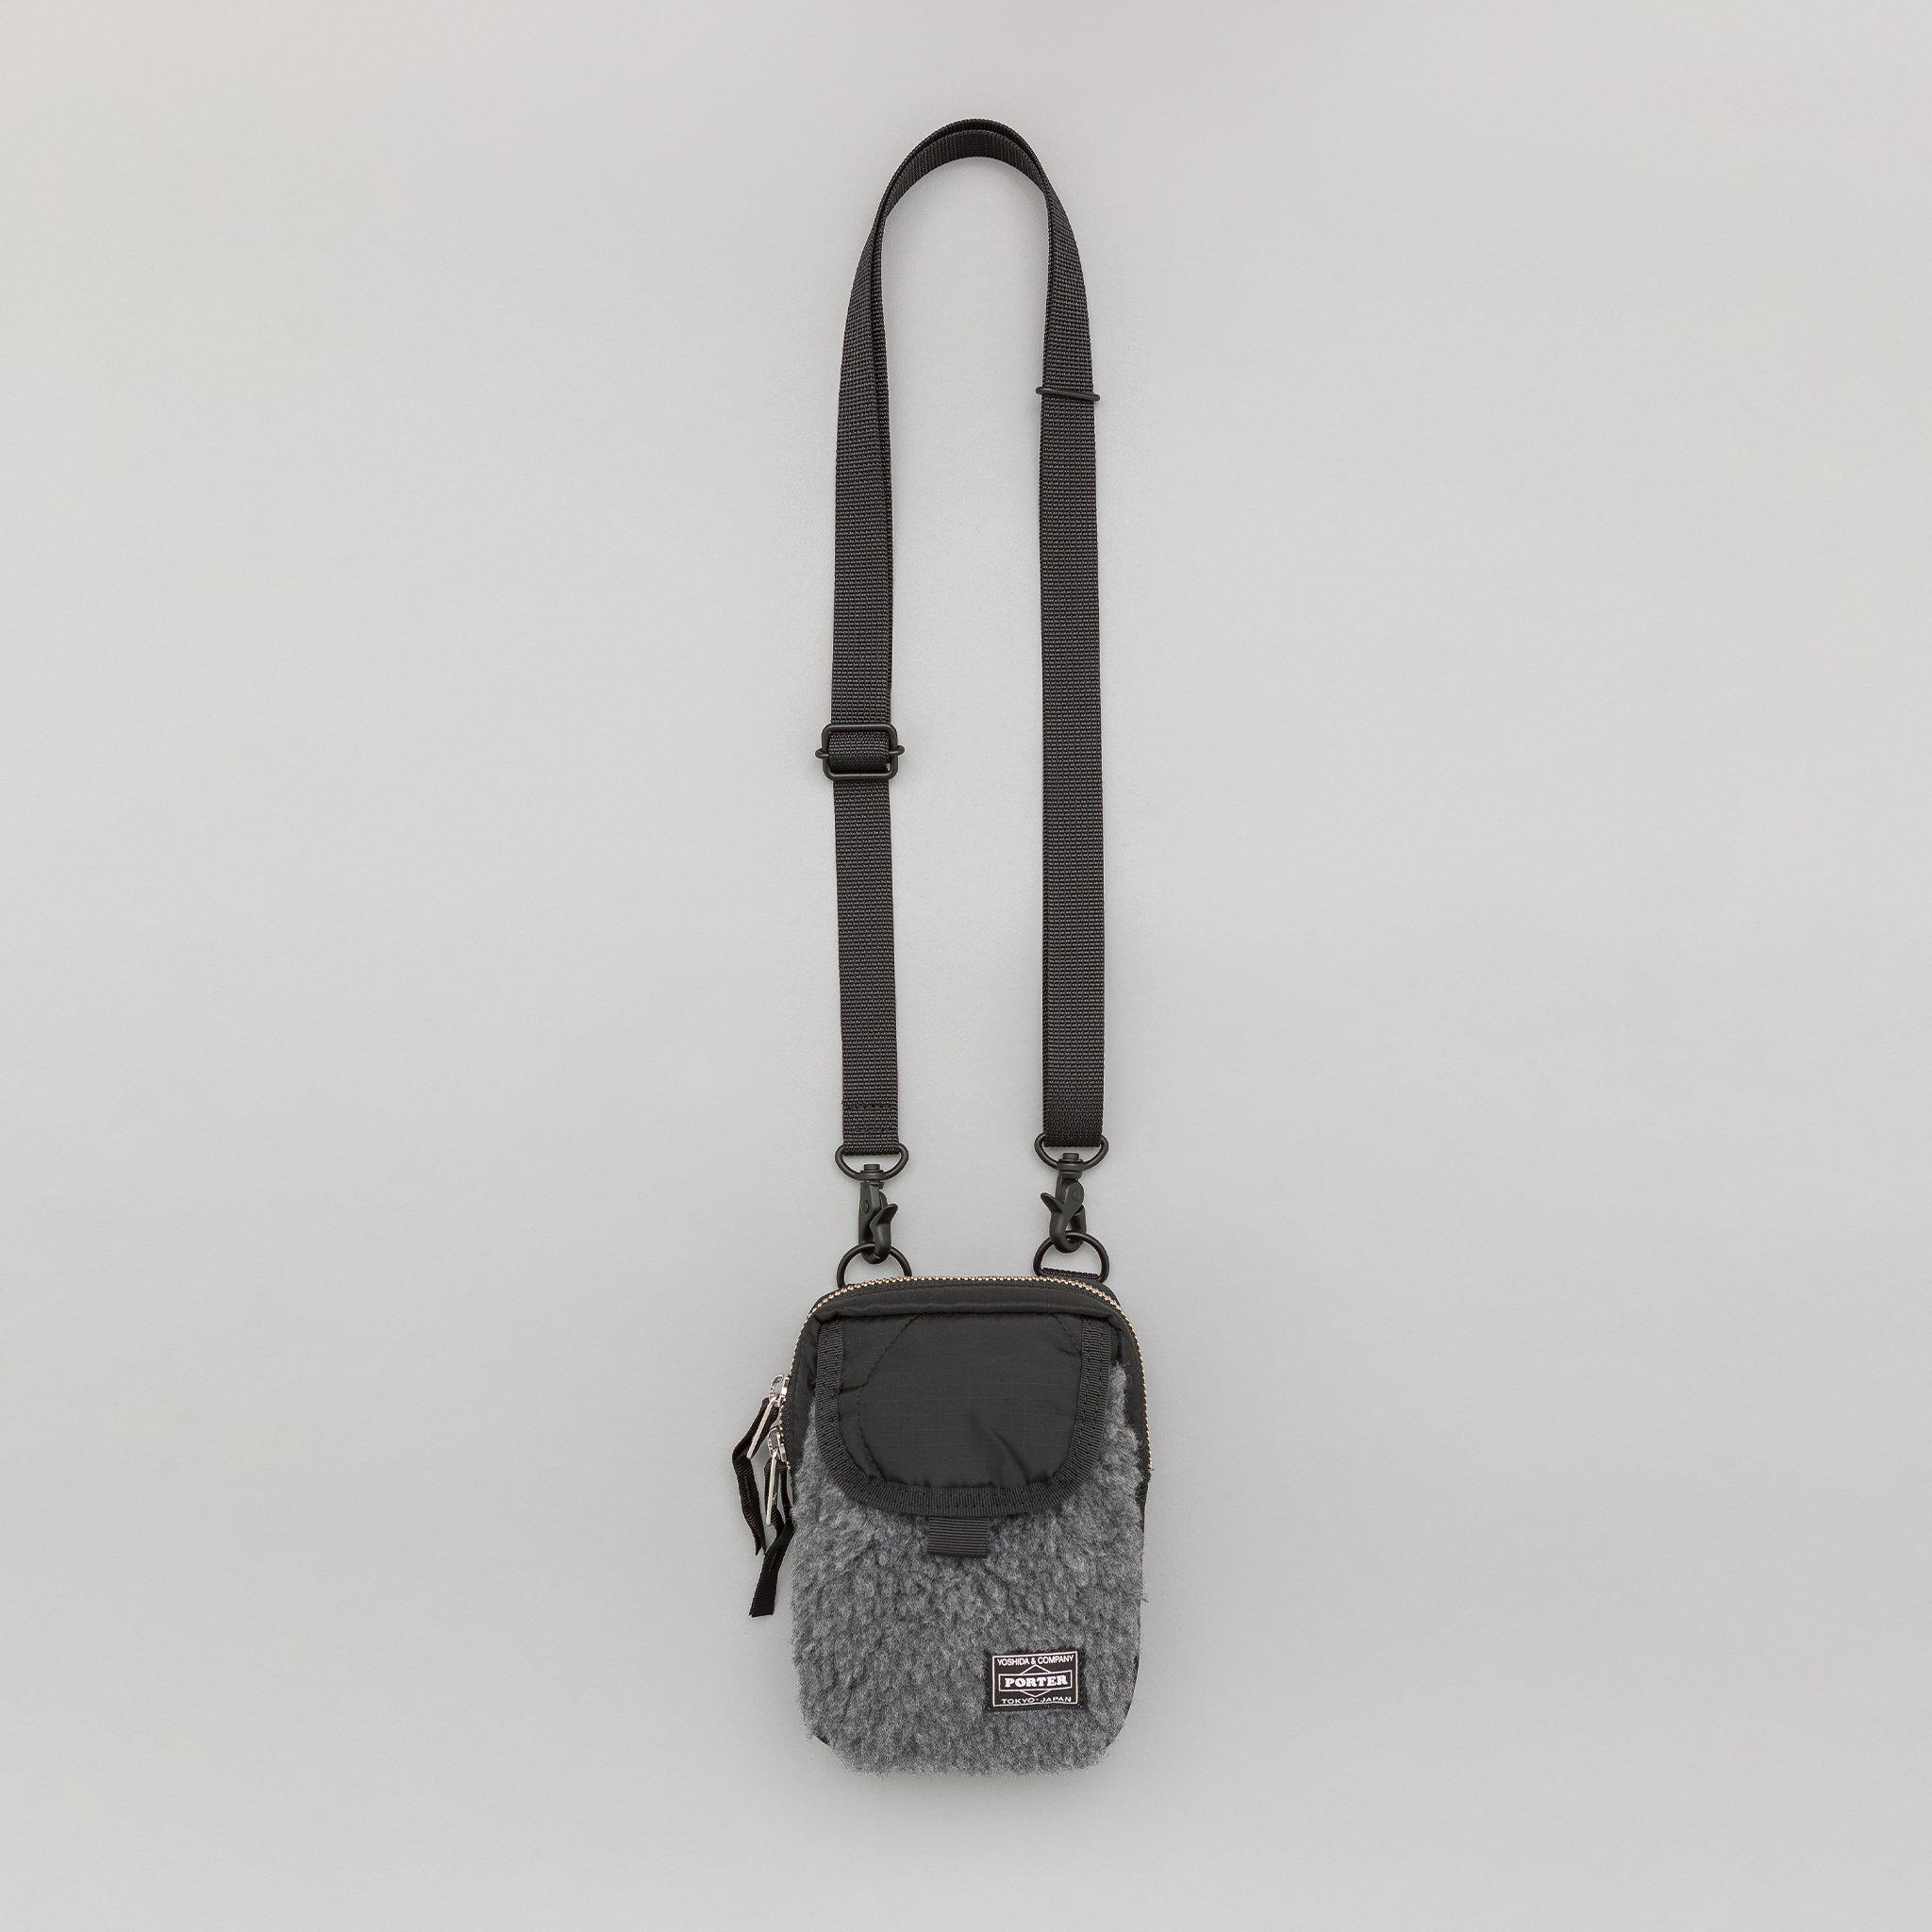 878f6fb5f101 Lyst - Head Porter Kerry Shoulder Pouch In Black in Black for Men